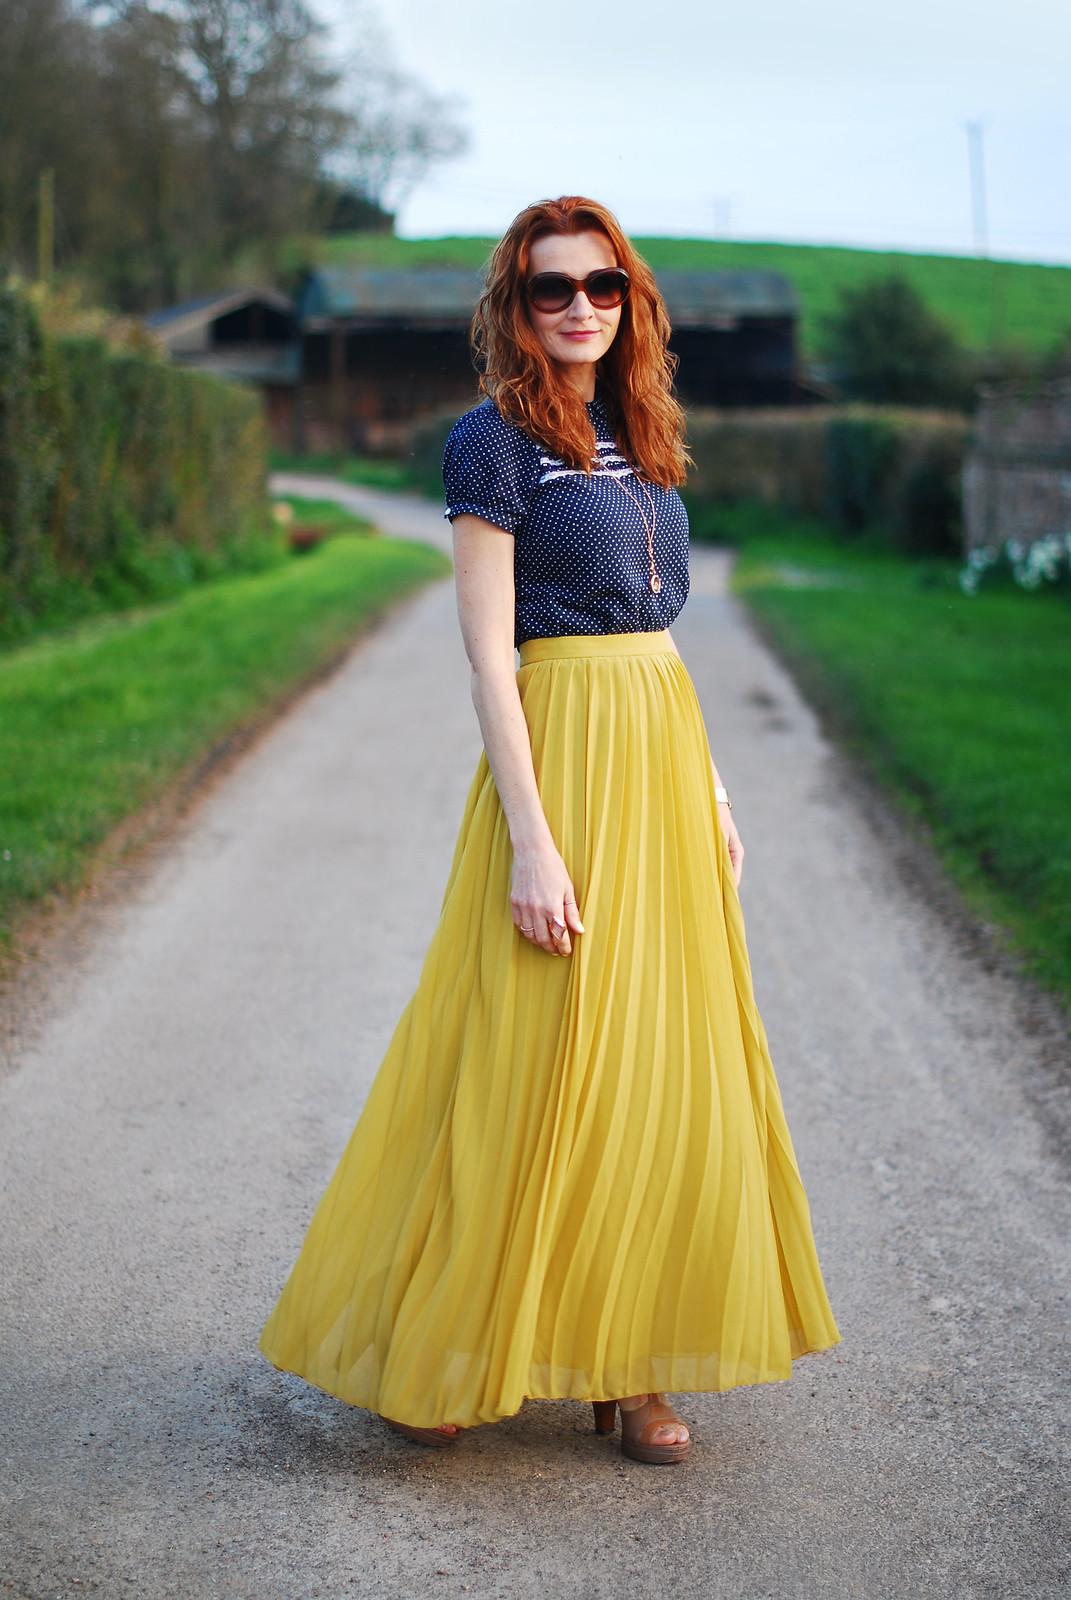 Navy polka dots & mustard yellow pleated skirt